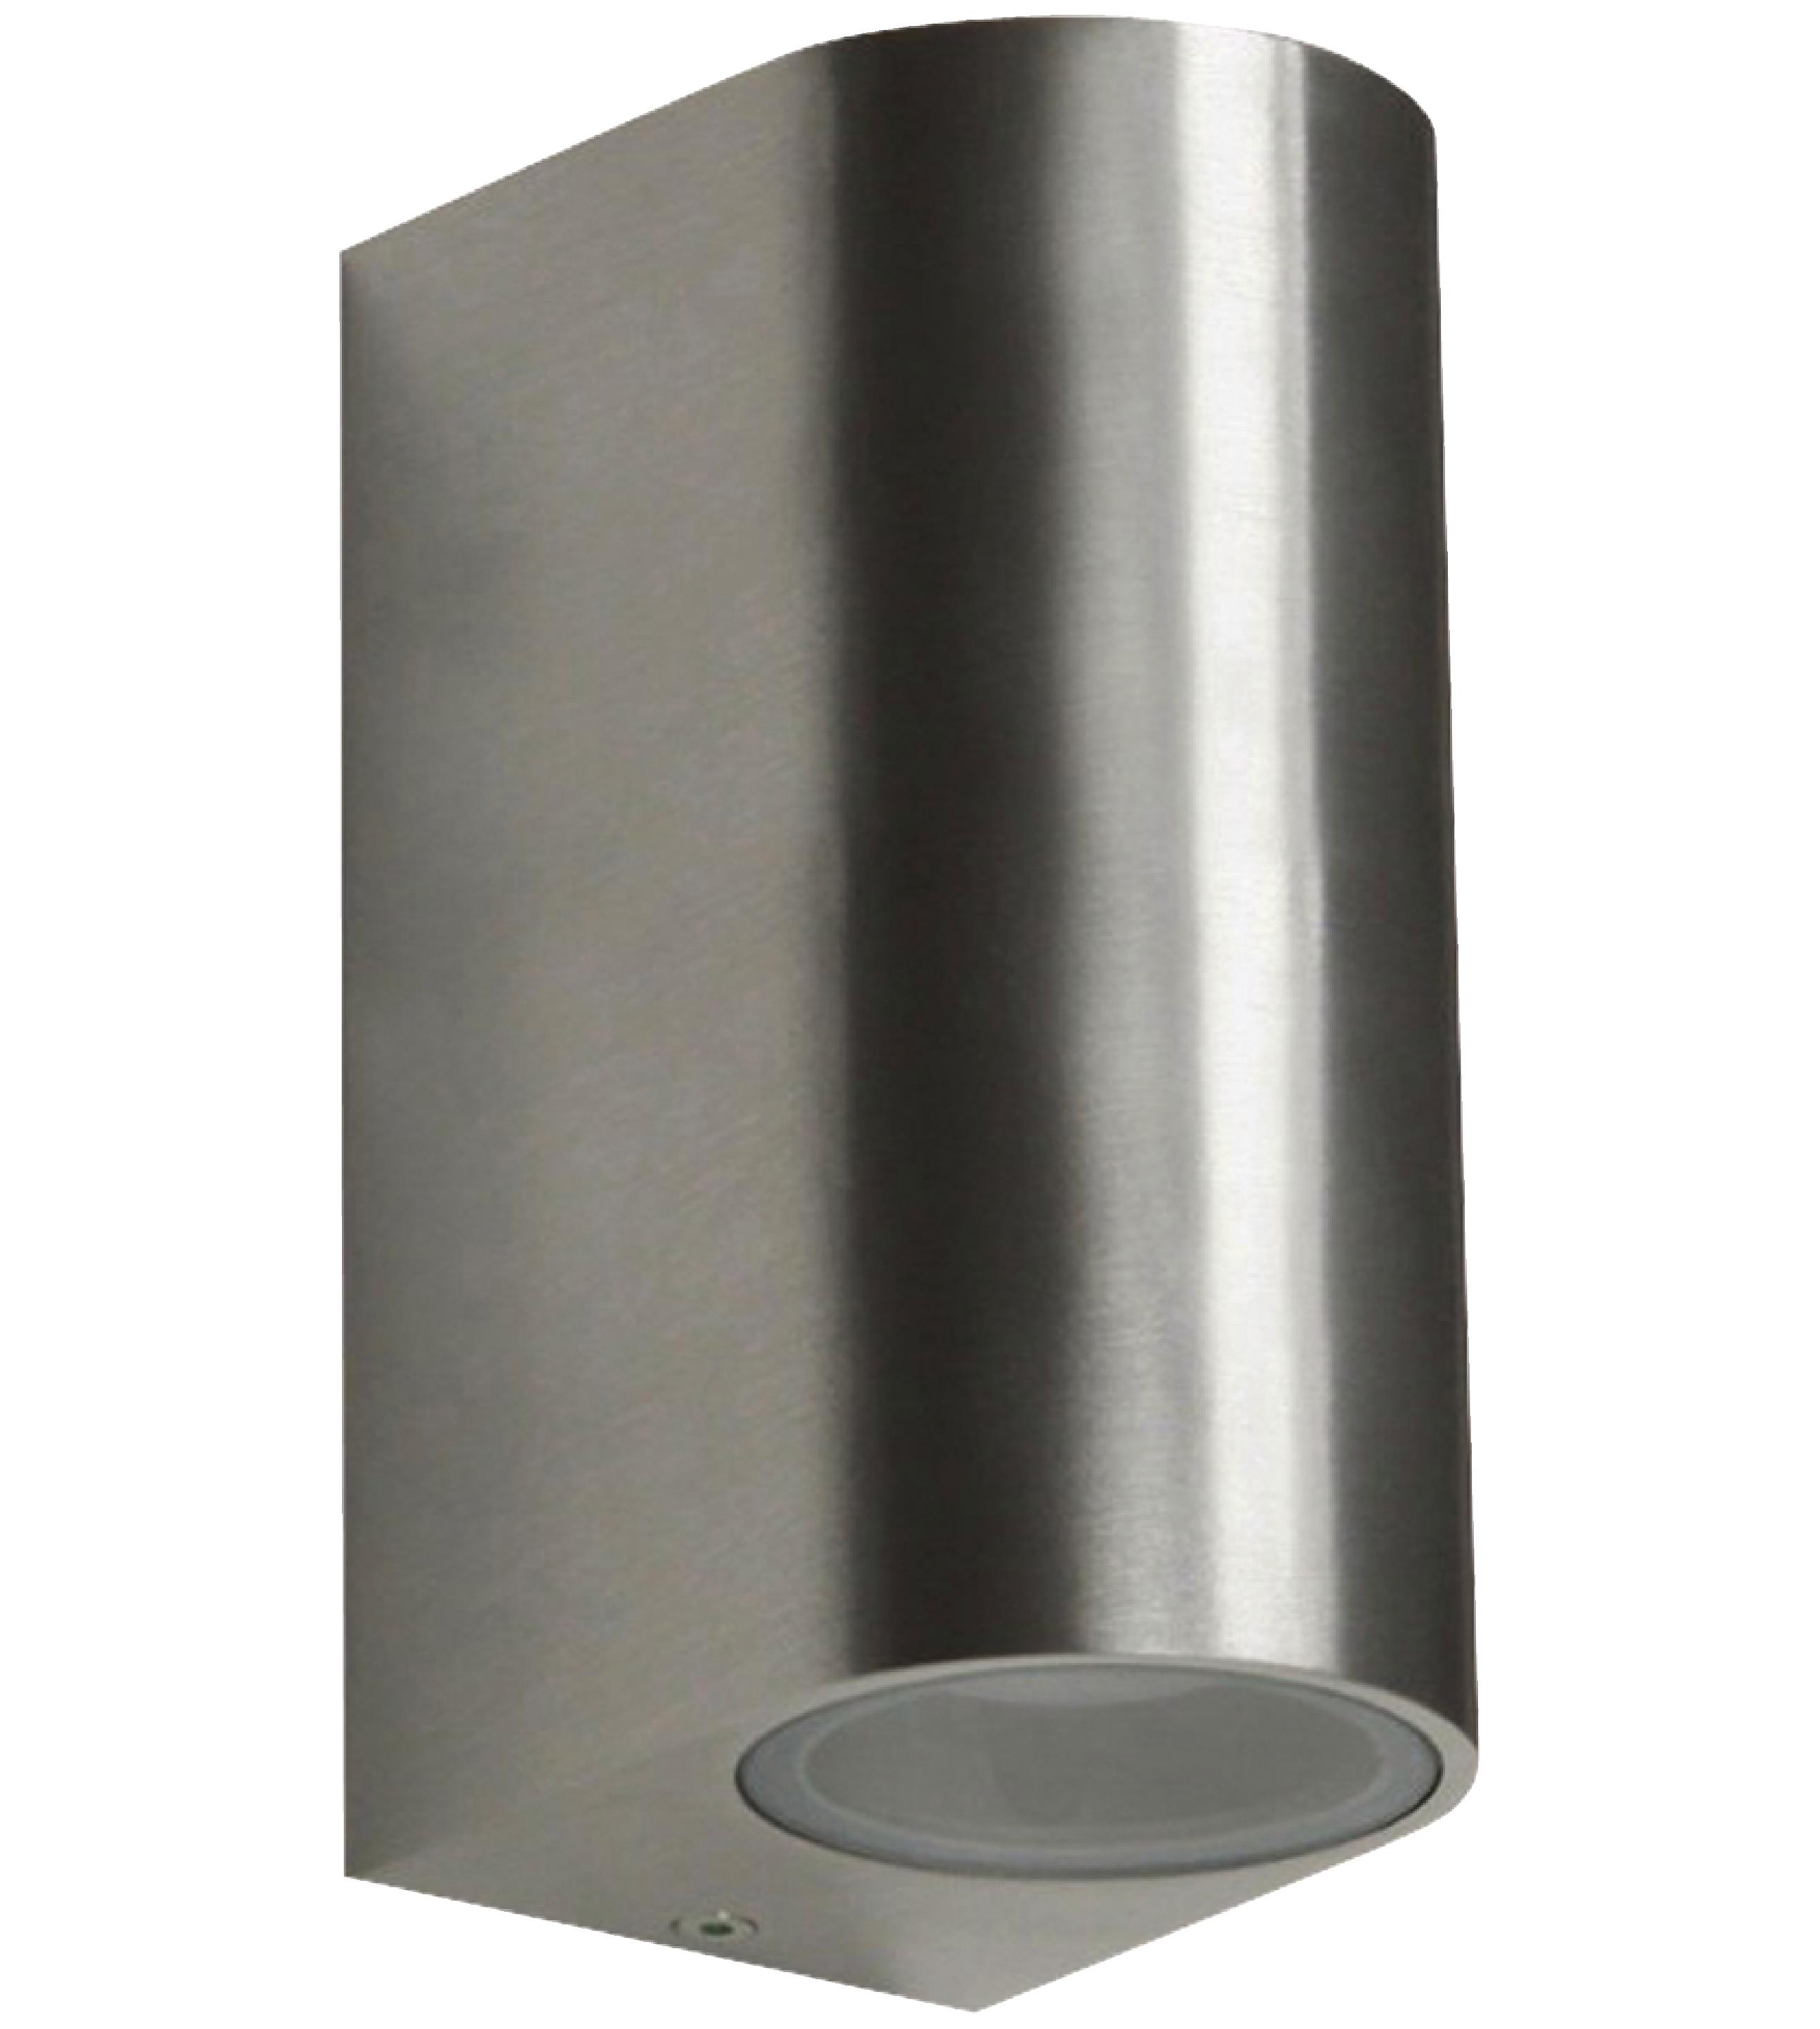 led-aussenwandleuchte-6-w-380-lm-aluminium